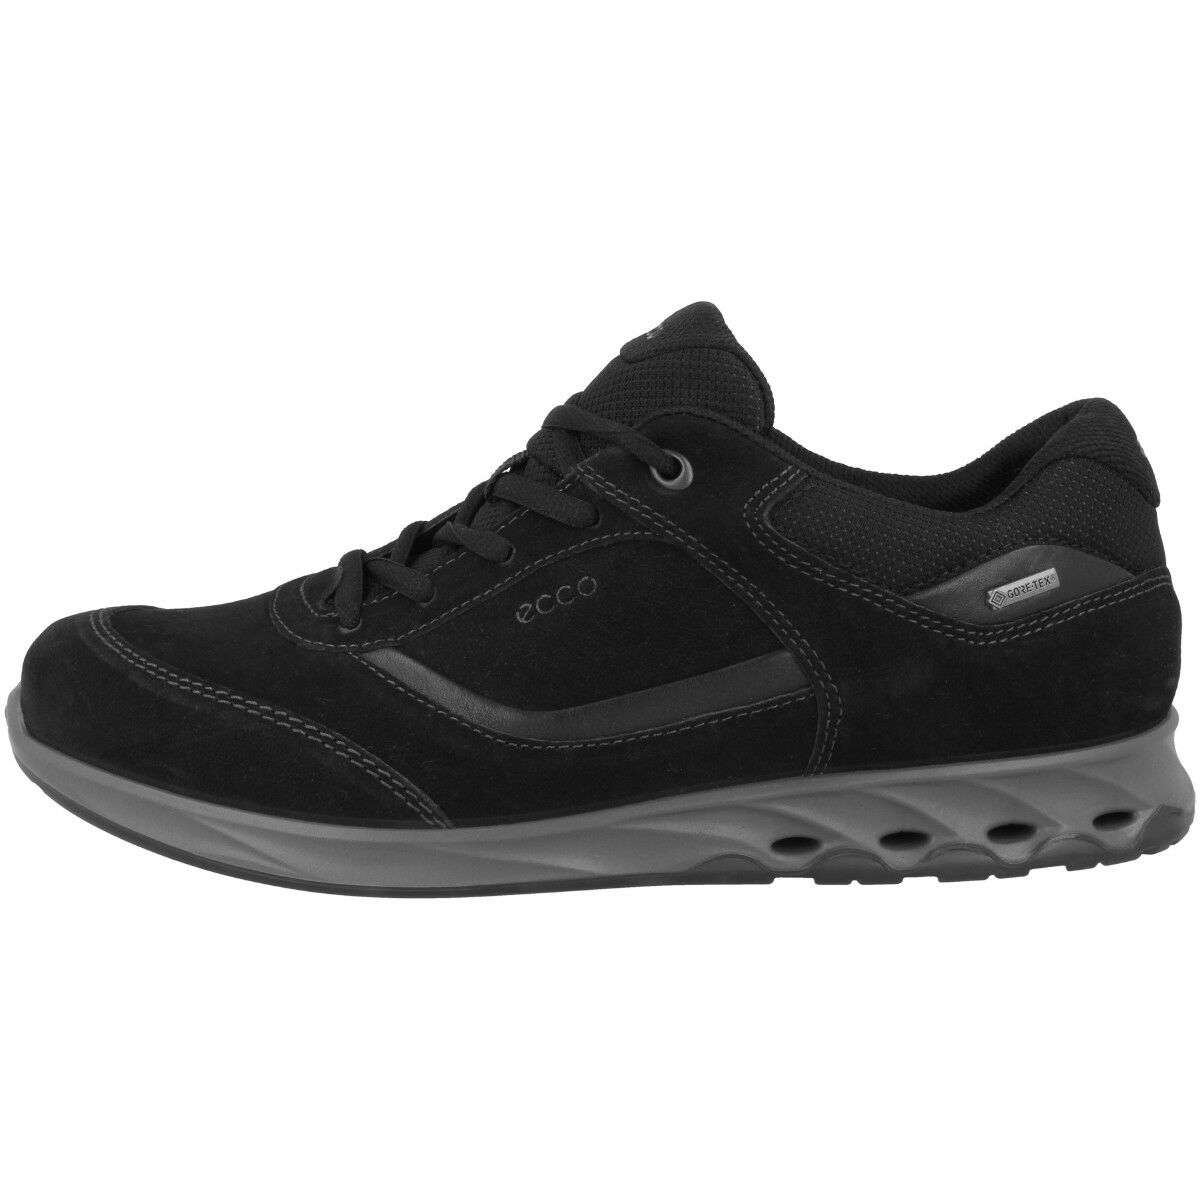 Ecco Wayfly Rigger GTX GTX GTX damen Trekking Damen Outdoor Schuhe schwarz 835203-51052 0f59e1